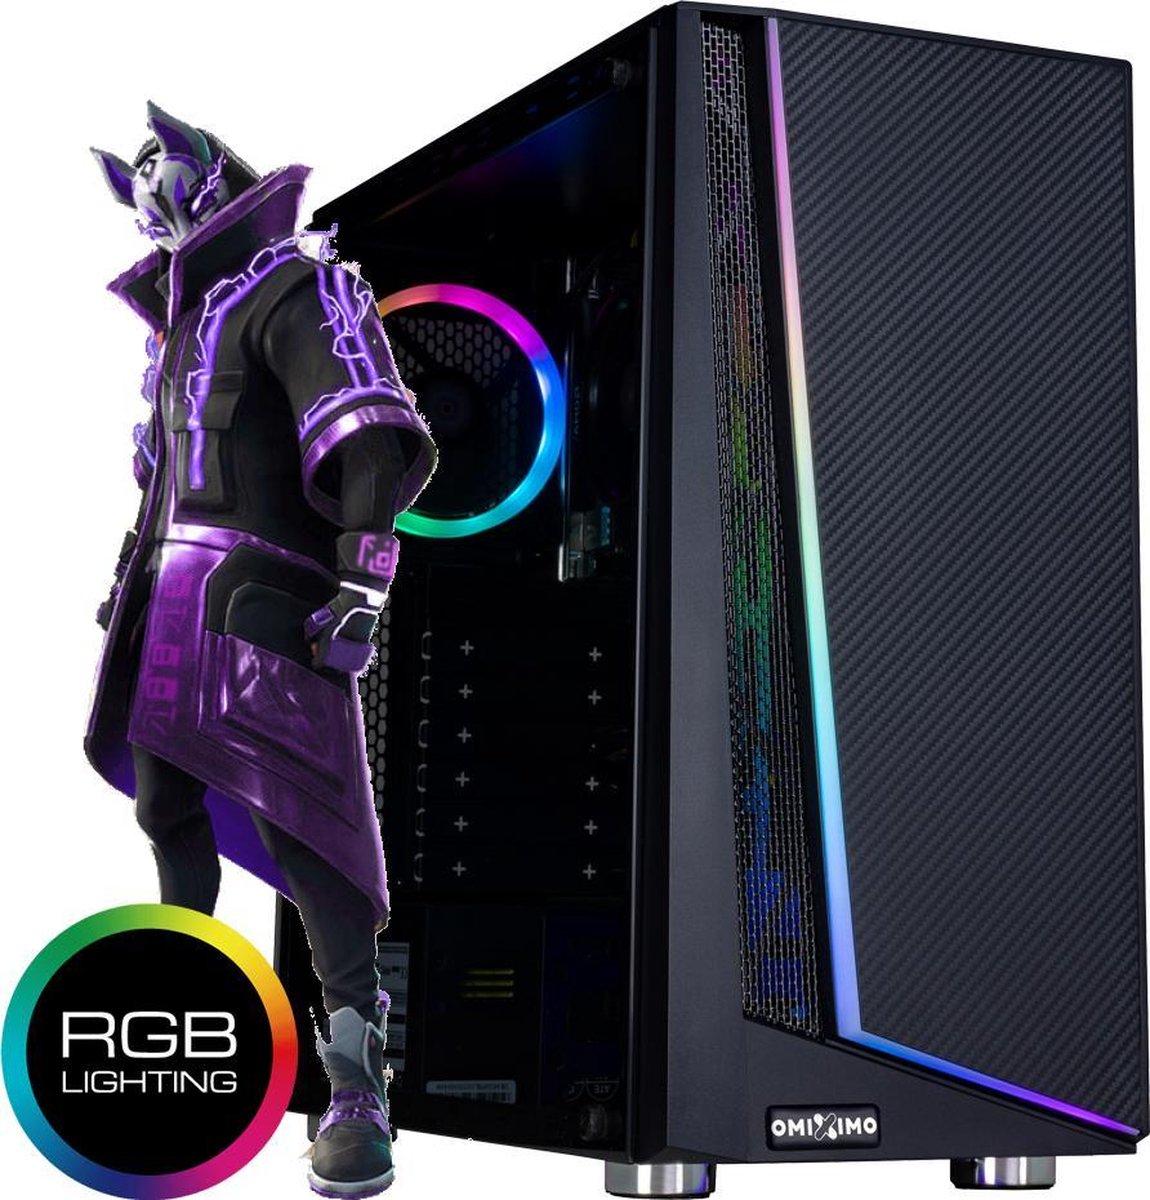 omiXimo | AMD Ryzen 3  | Gaming PC |  8 GB ram | 240 GB SSD | WiFi